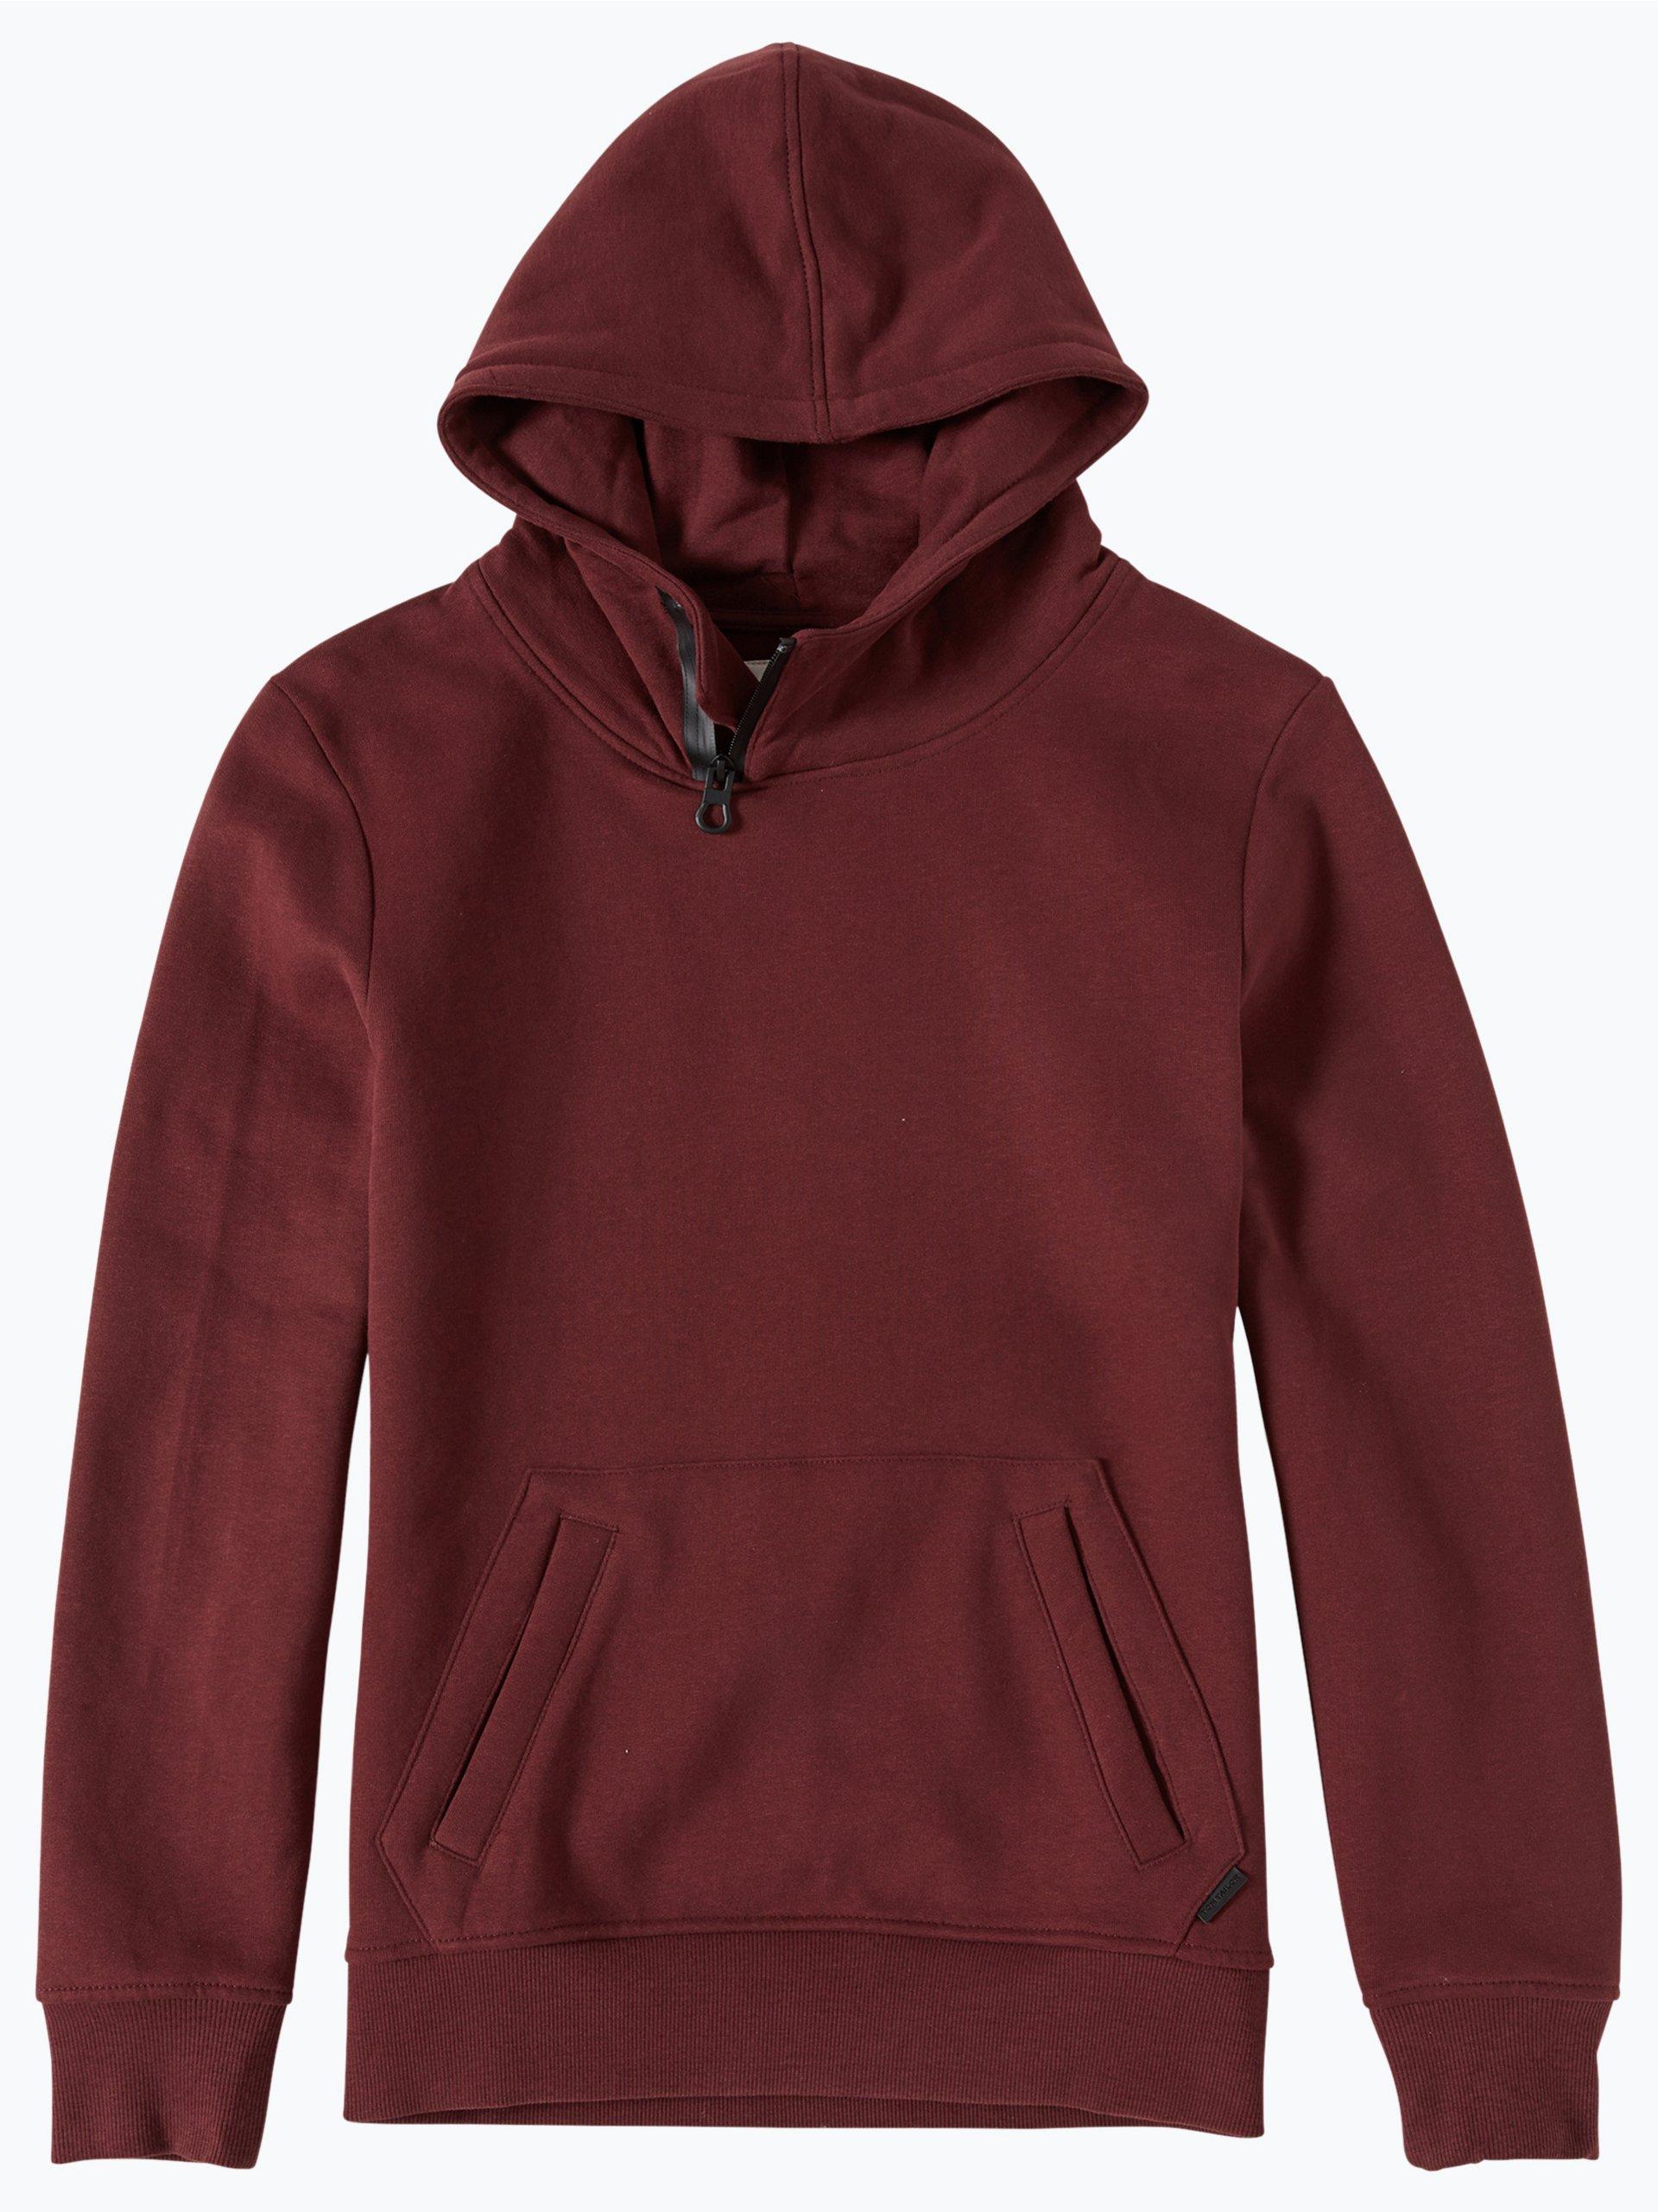 tom tailor jungen sweatshirt bordeaux uni online kaufen. Black Bedroom Furniture Sets. Home Design Ideas